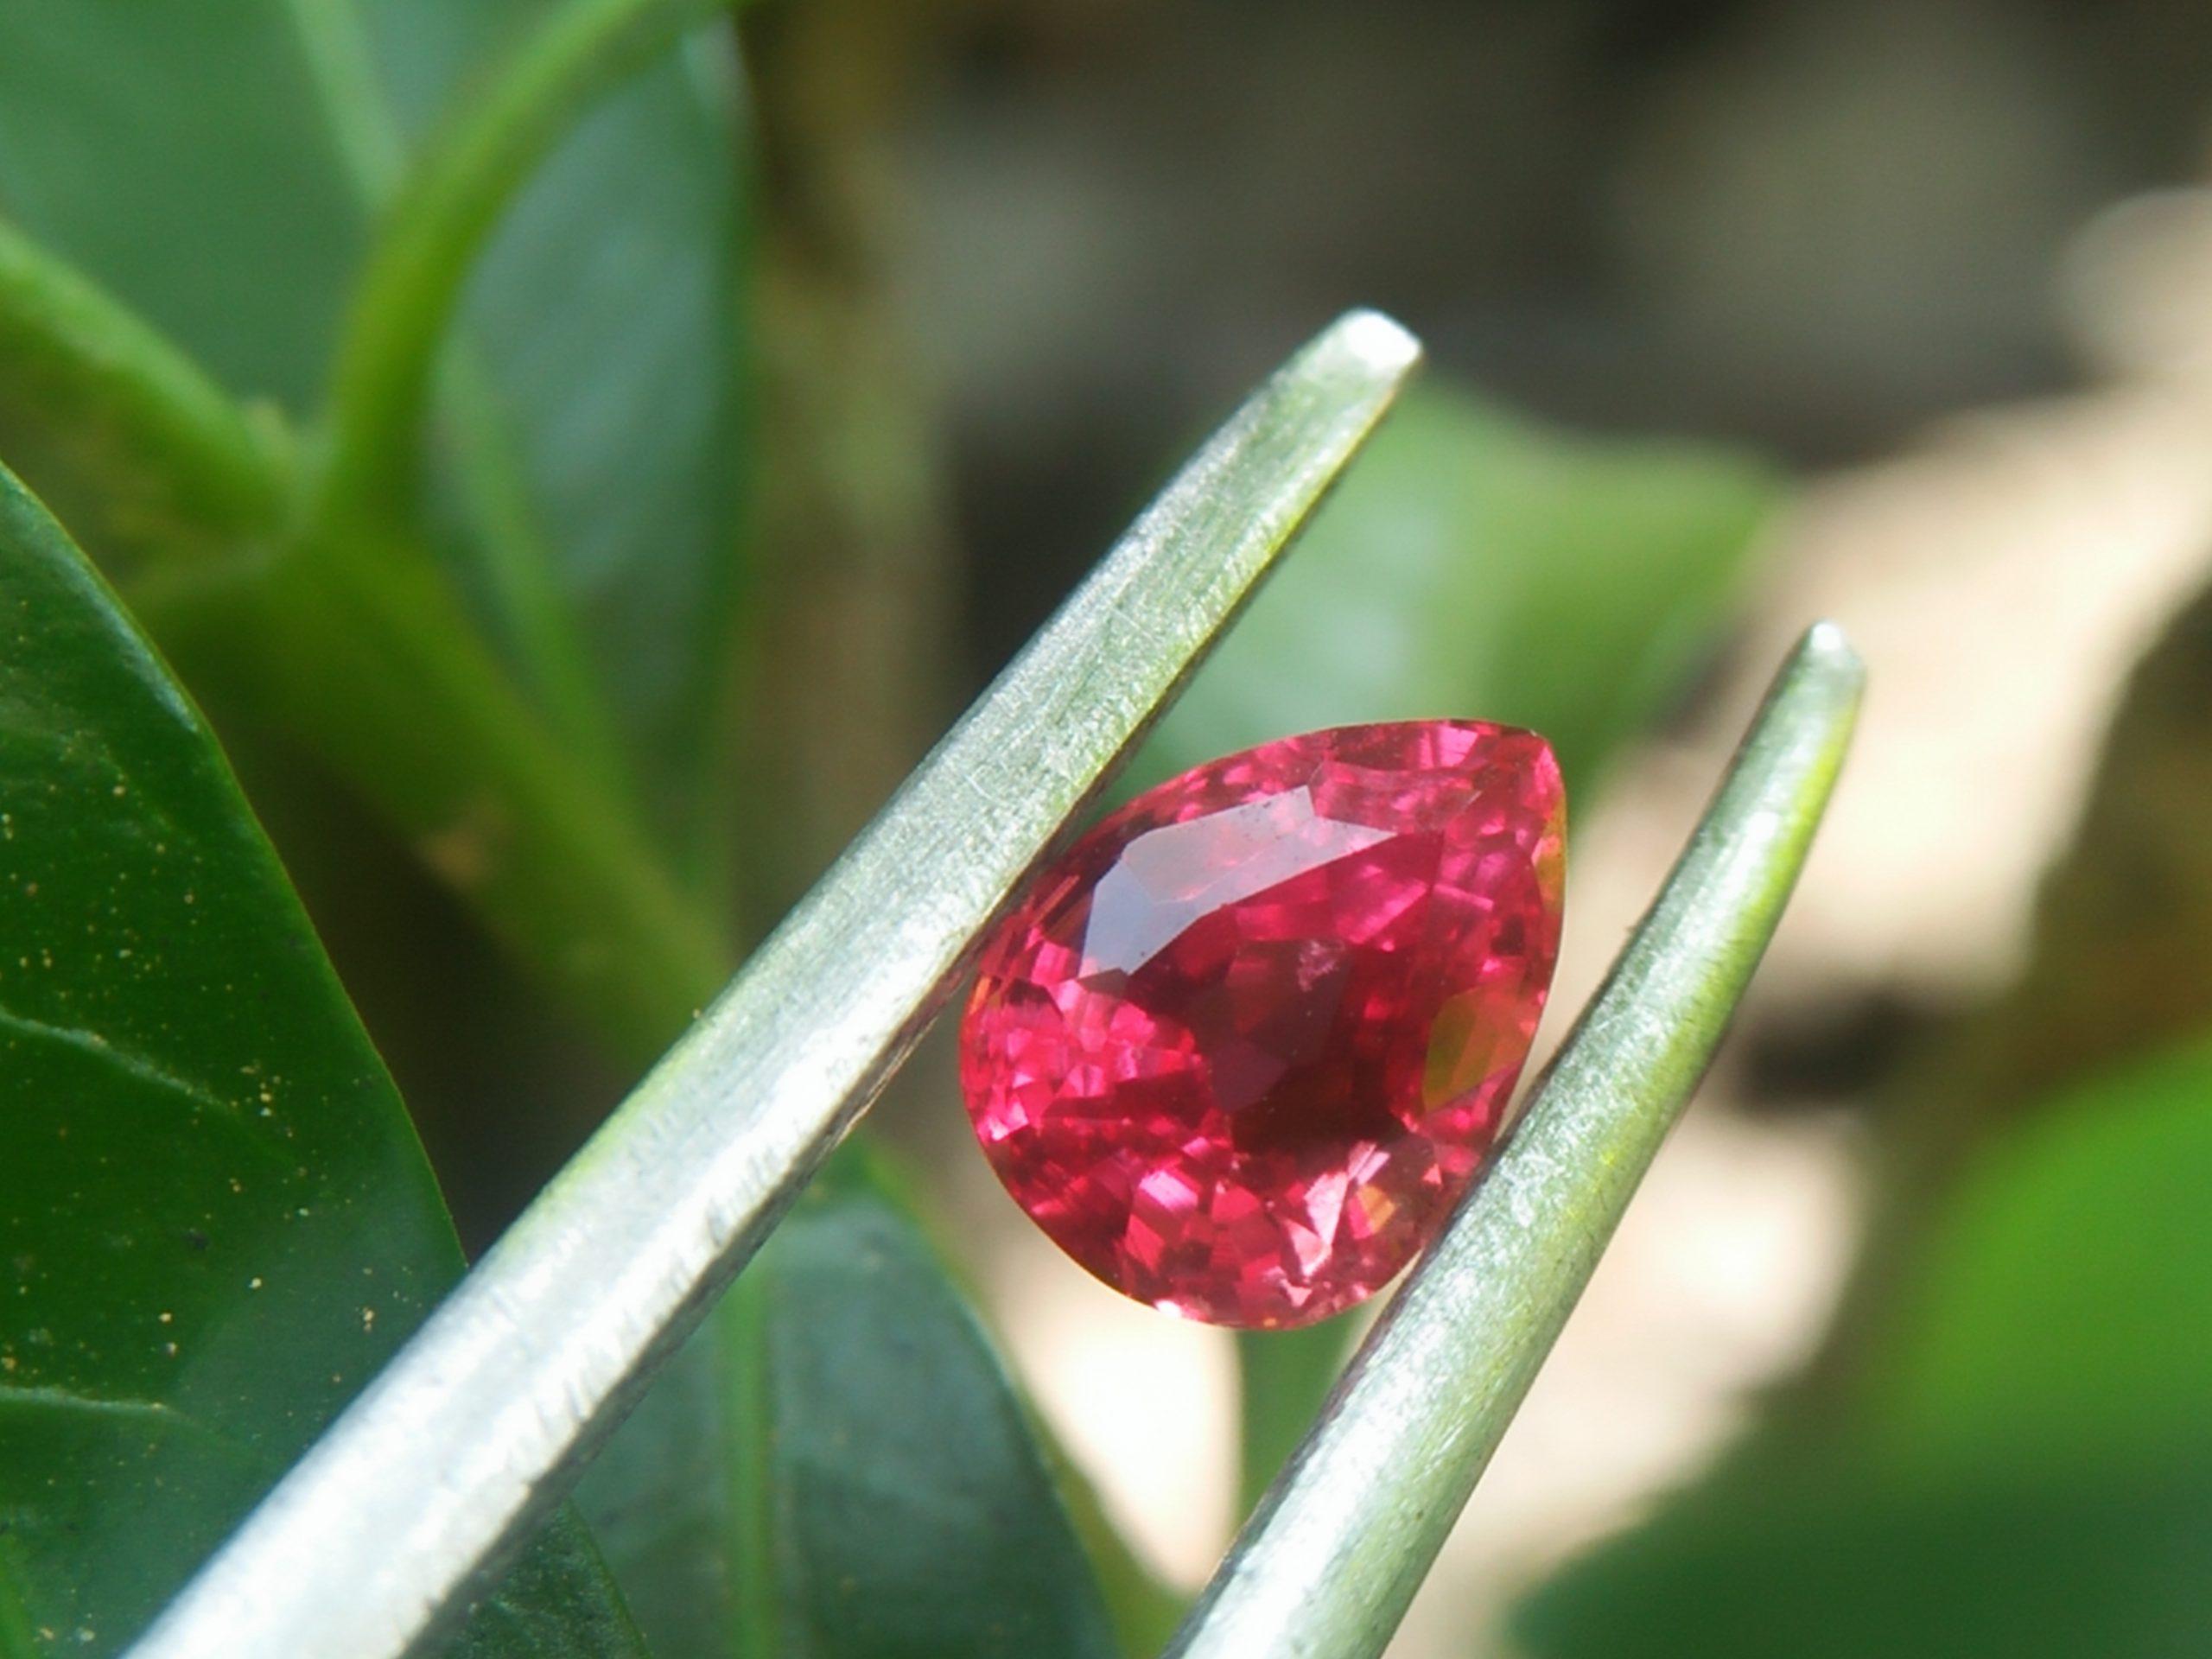 Natural Sunset Ruby/Padpardscha Sapphire Colour : Pinkish Orange Padparadscha Shape : Pear Weight : 0.54cts Dimension : 5.0 x 3.7 x 3.3 mm Treatment : Heated Clarity : SI 黃色的藍寶石 重量 : 0.54 卡拉 尺寸 : 5.0 x 3.7 x 3.3 mm 颜色 : 粉色橙色 透明 : 好透明 形状 : 梨形 清晰度 : SI 治疗: 加热 • CSL - Colored Stone Laboratory Certified ( GIA Alumina Association Member ) • CSL Memo No : 81F7CD06EE49